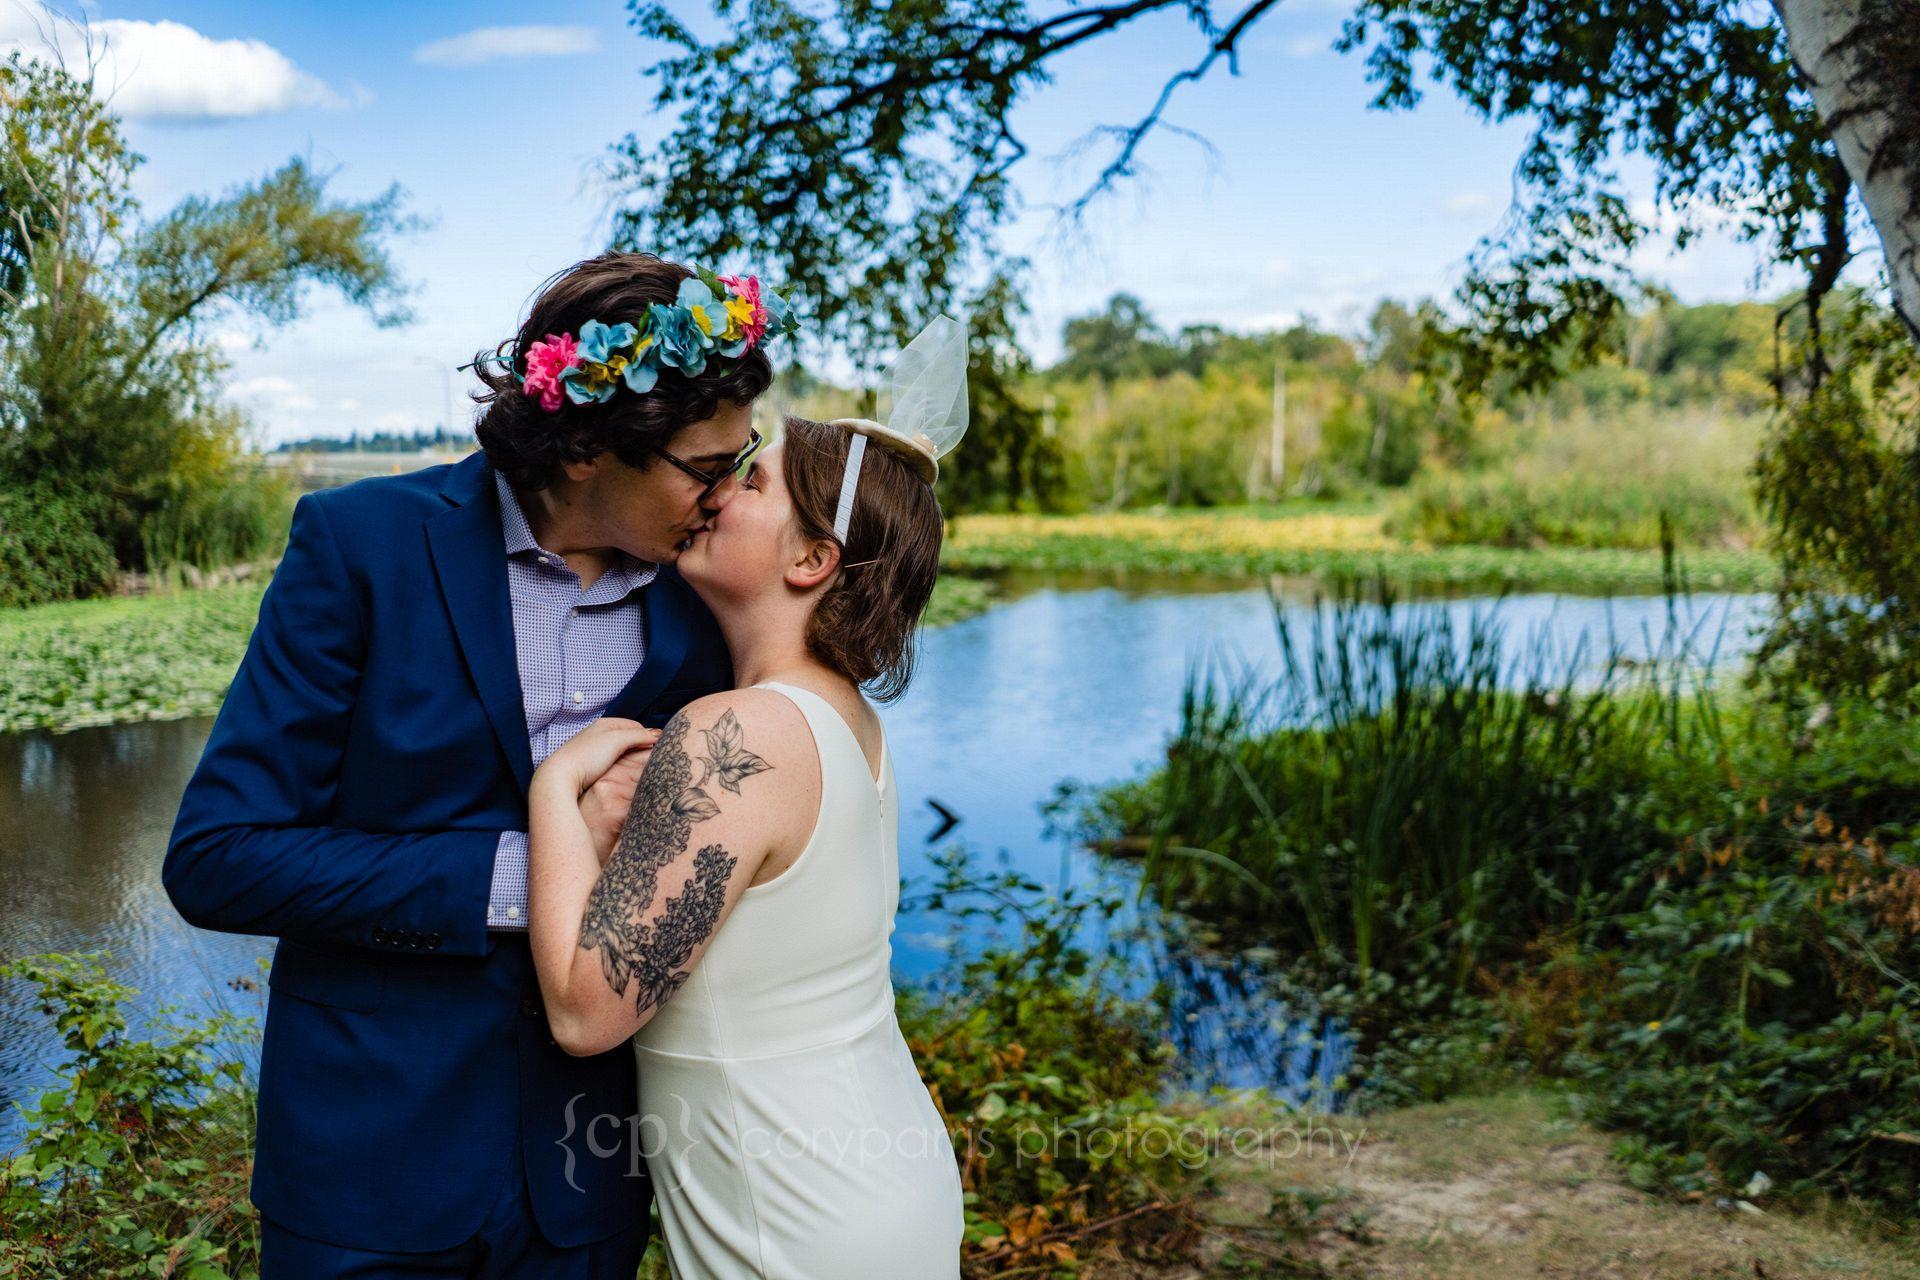 048-arboretum-seattle-wedding.jpg